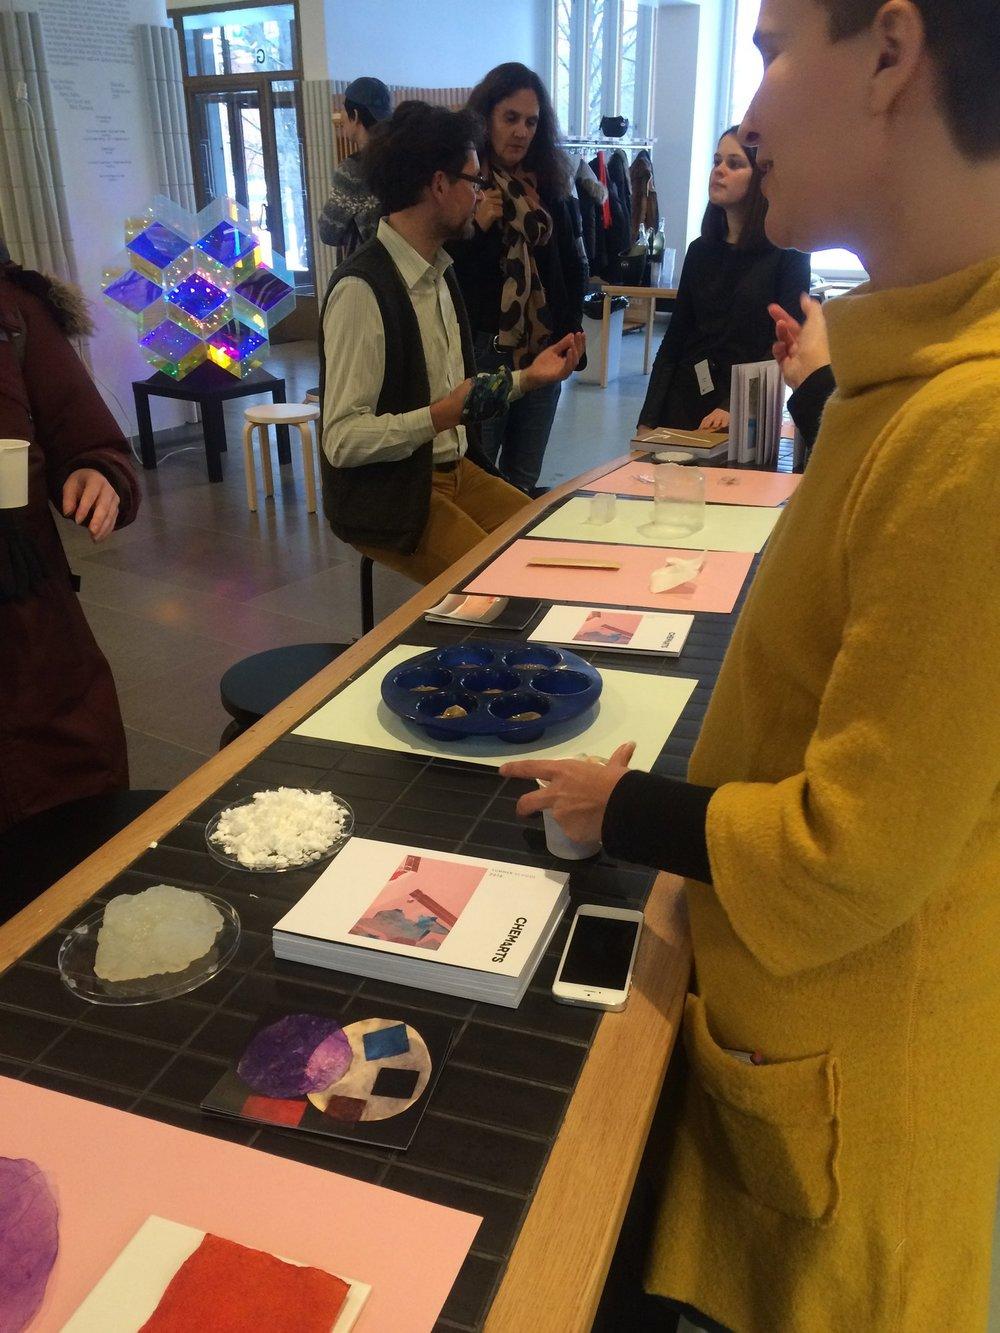 Unexpected Encounters // Images: Mikko Raskinen / Aalto University